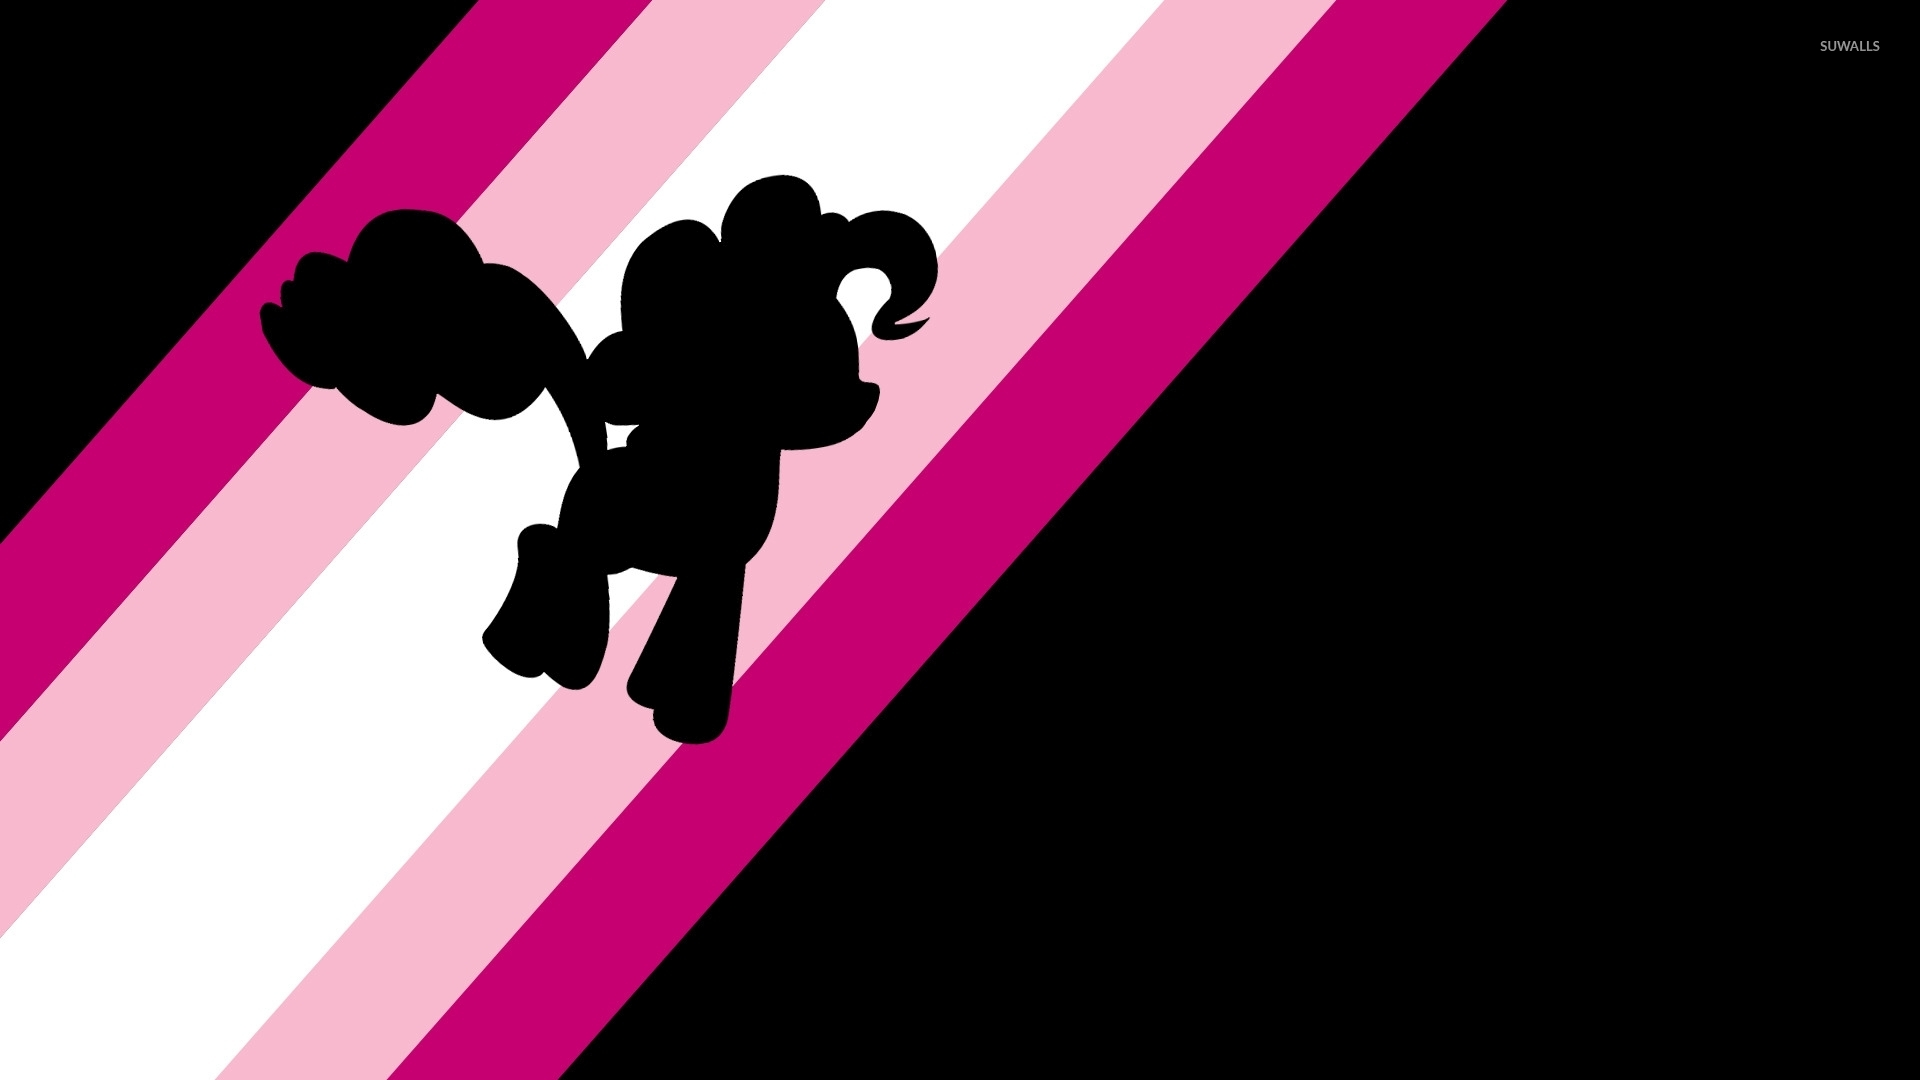 Pinkie Pie On Pink Rainbow My Little Pony Wallpaper Cartoon